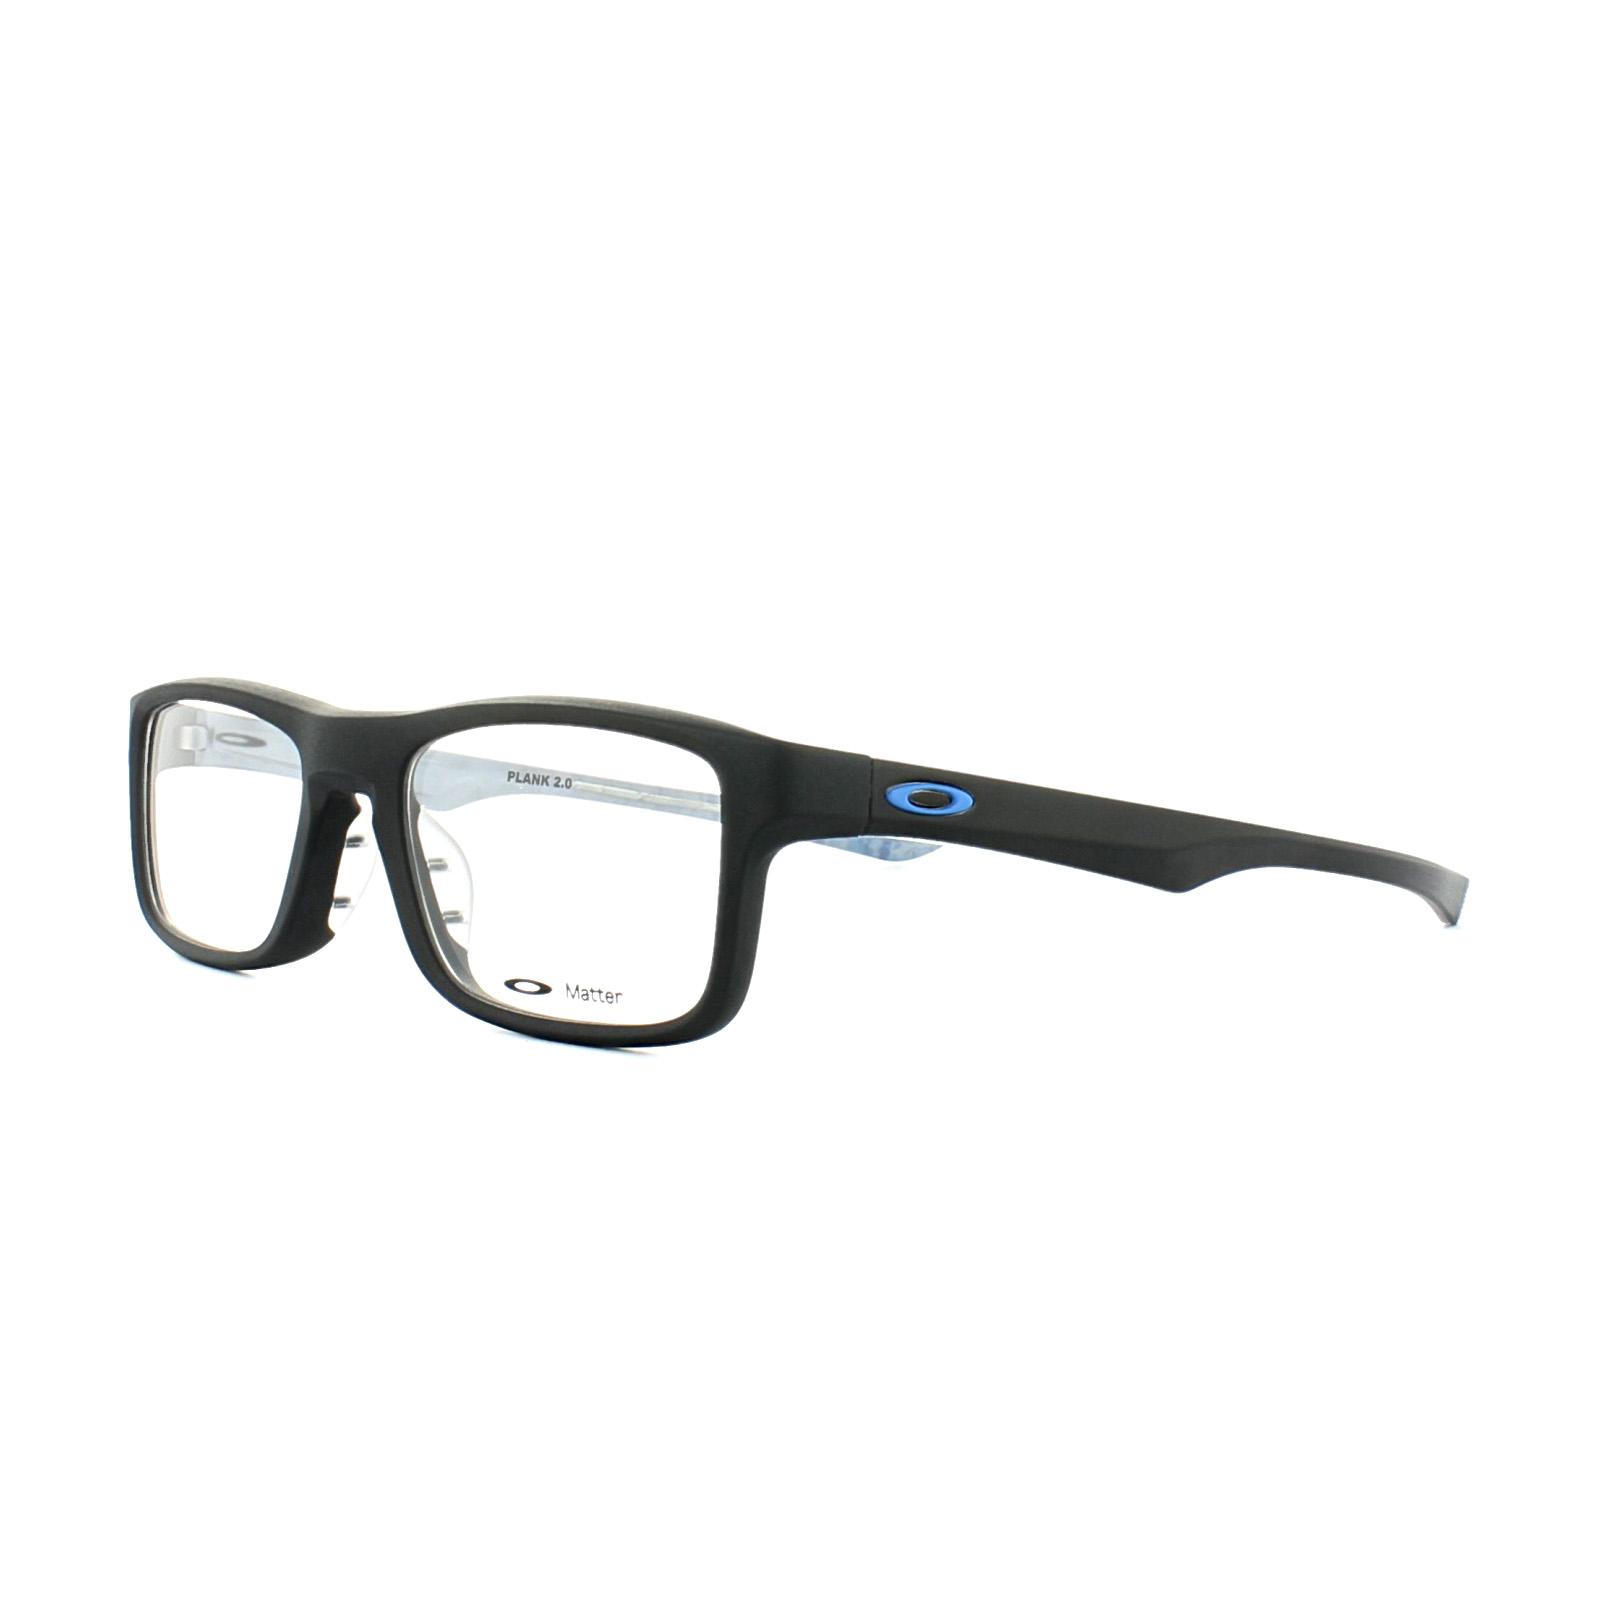 f4b6a4caa71 Cheap Oakley Plank 2.0 Glasses Frames - Discounted Sunglasses